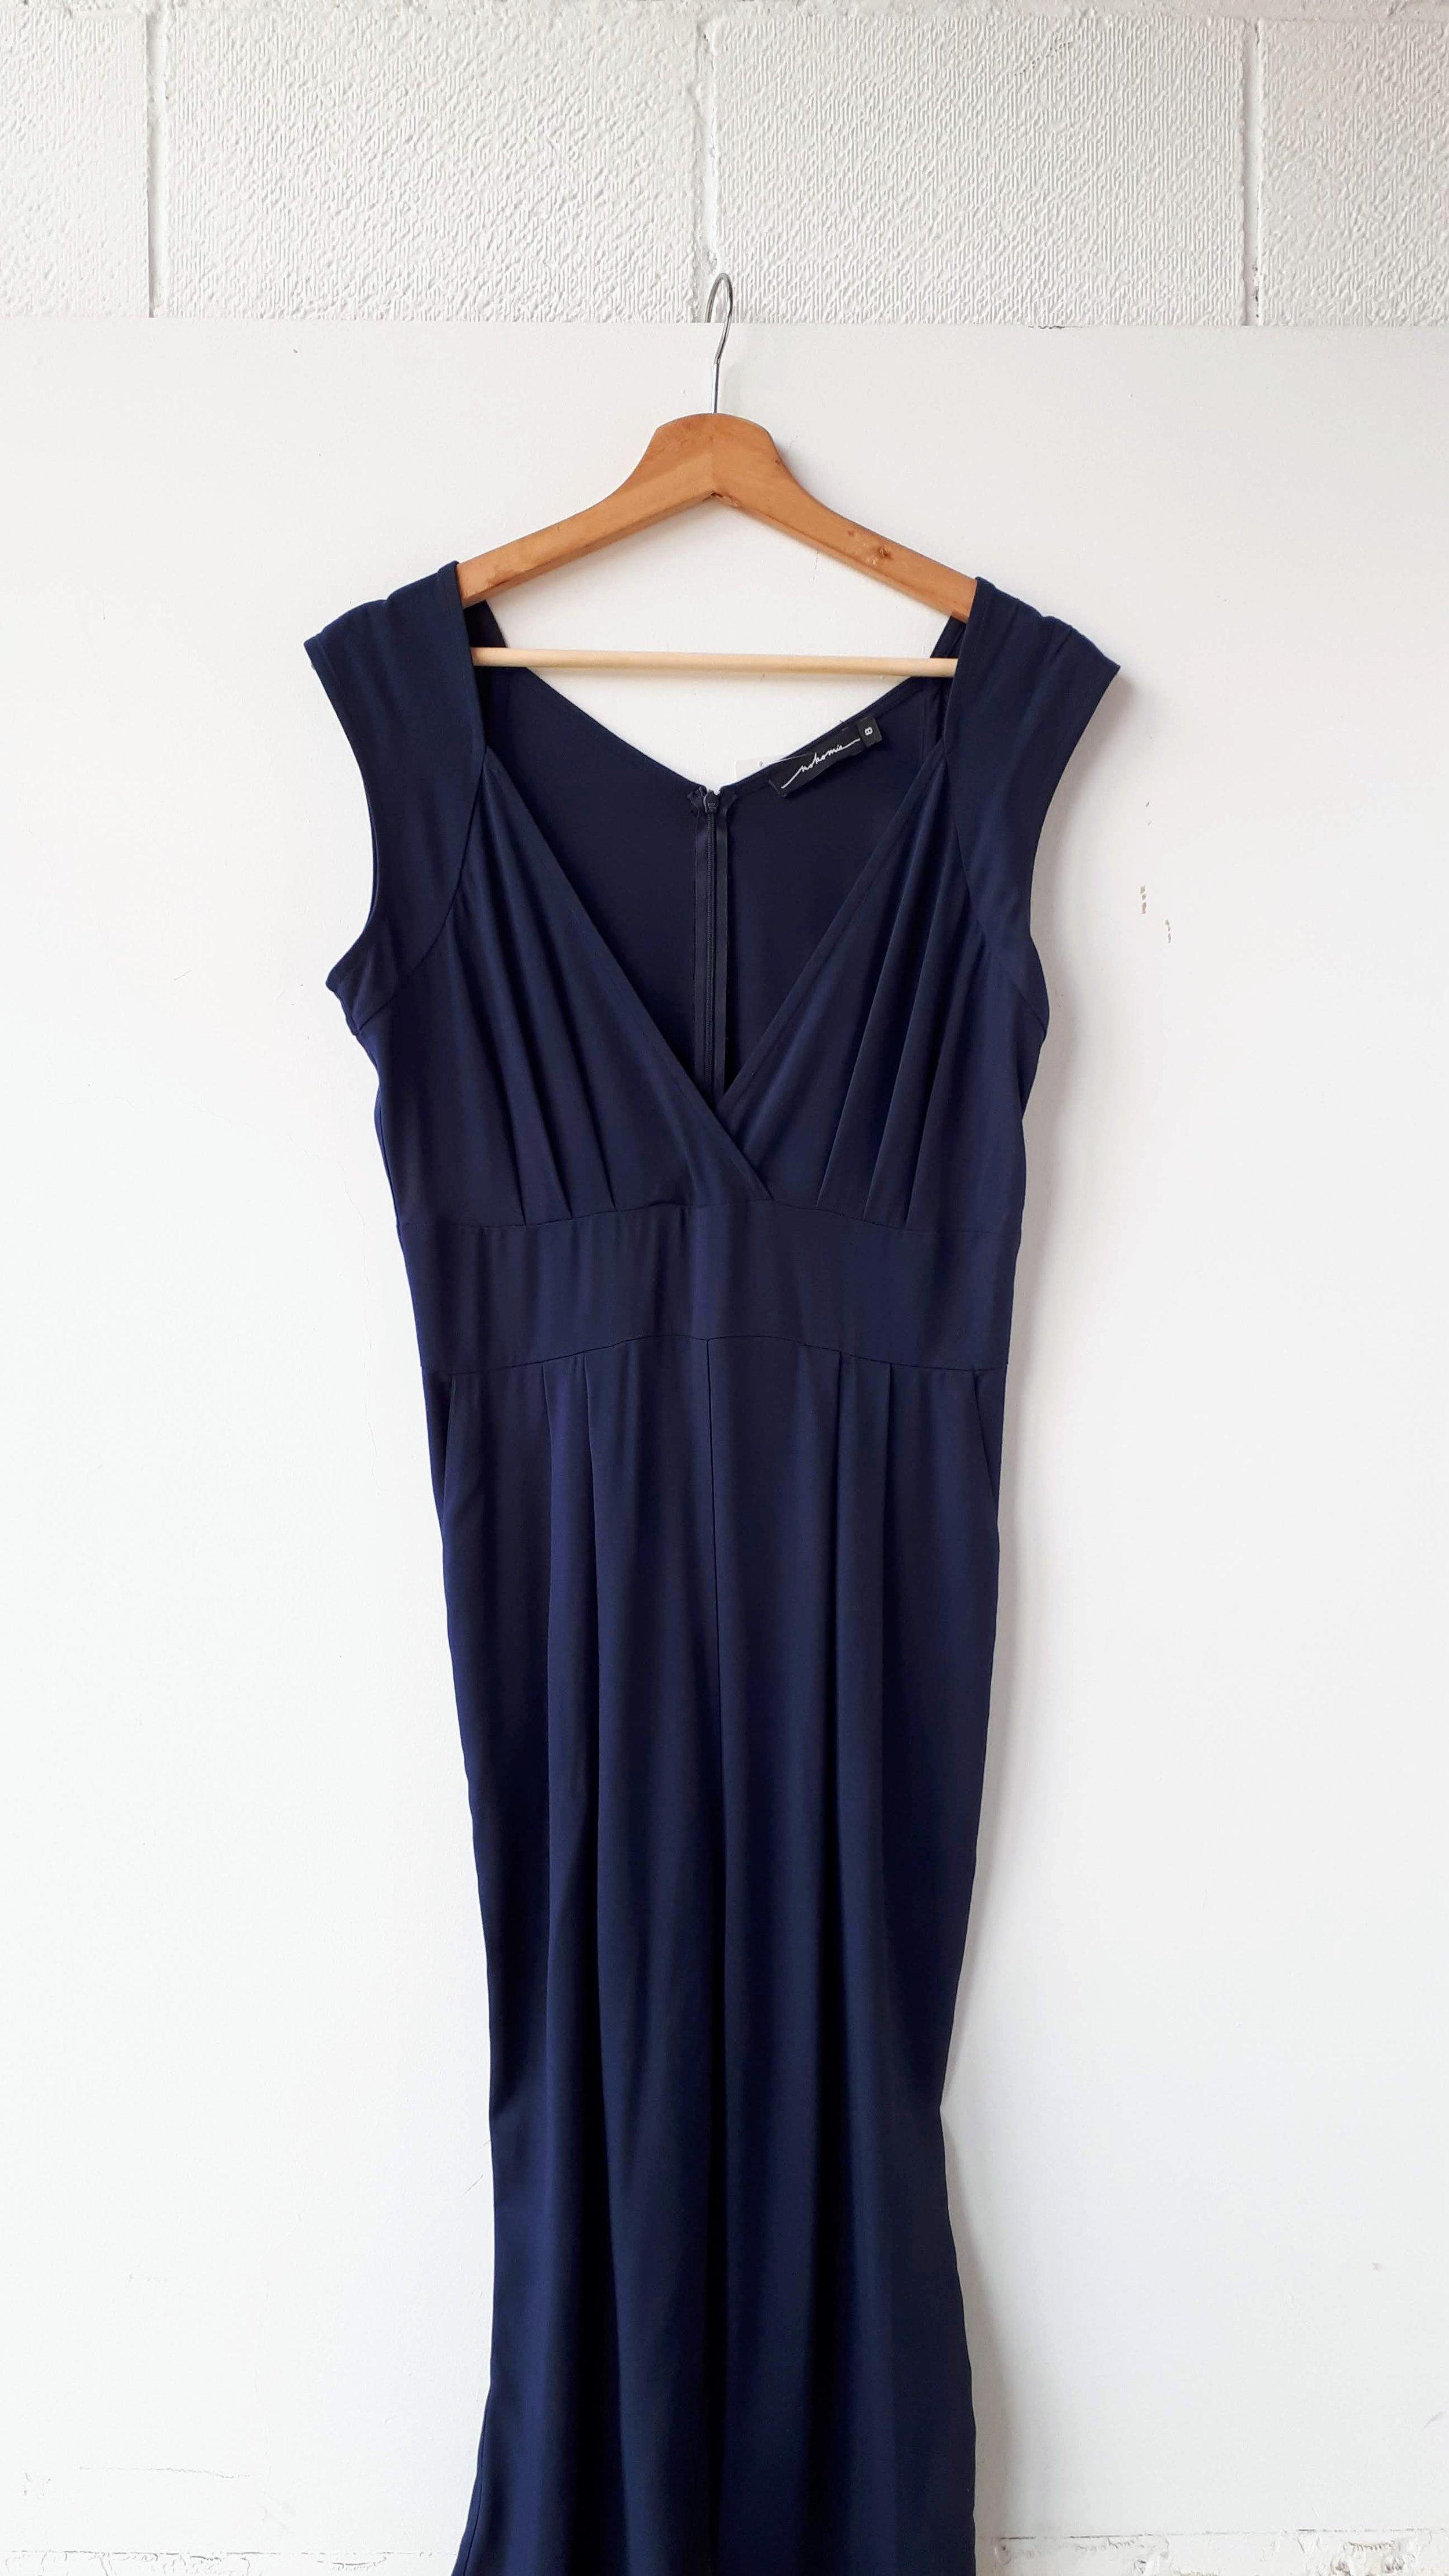 Nokomis romper (NWT); Size 8, $62